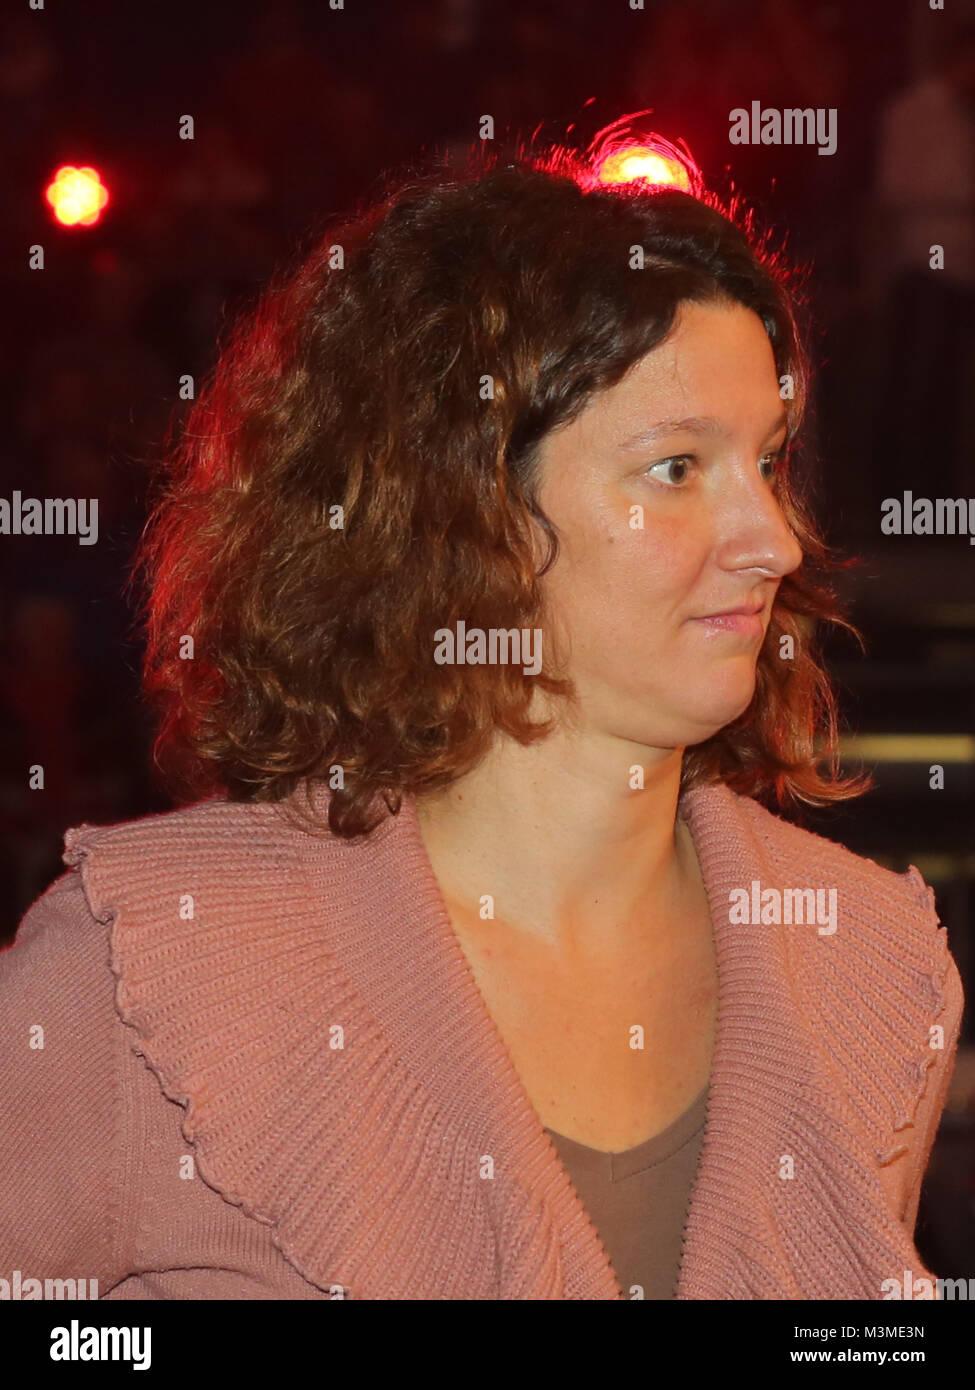 Schwimmerin Antje Buschulte (SC Magdeburg) als Ehrengast der SES-Box-Gala am 12.11.16 in der GETEC Arena Magdeburg - Stock Image